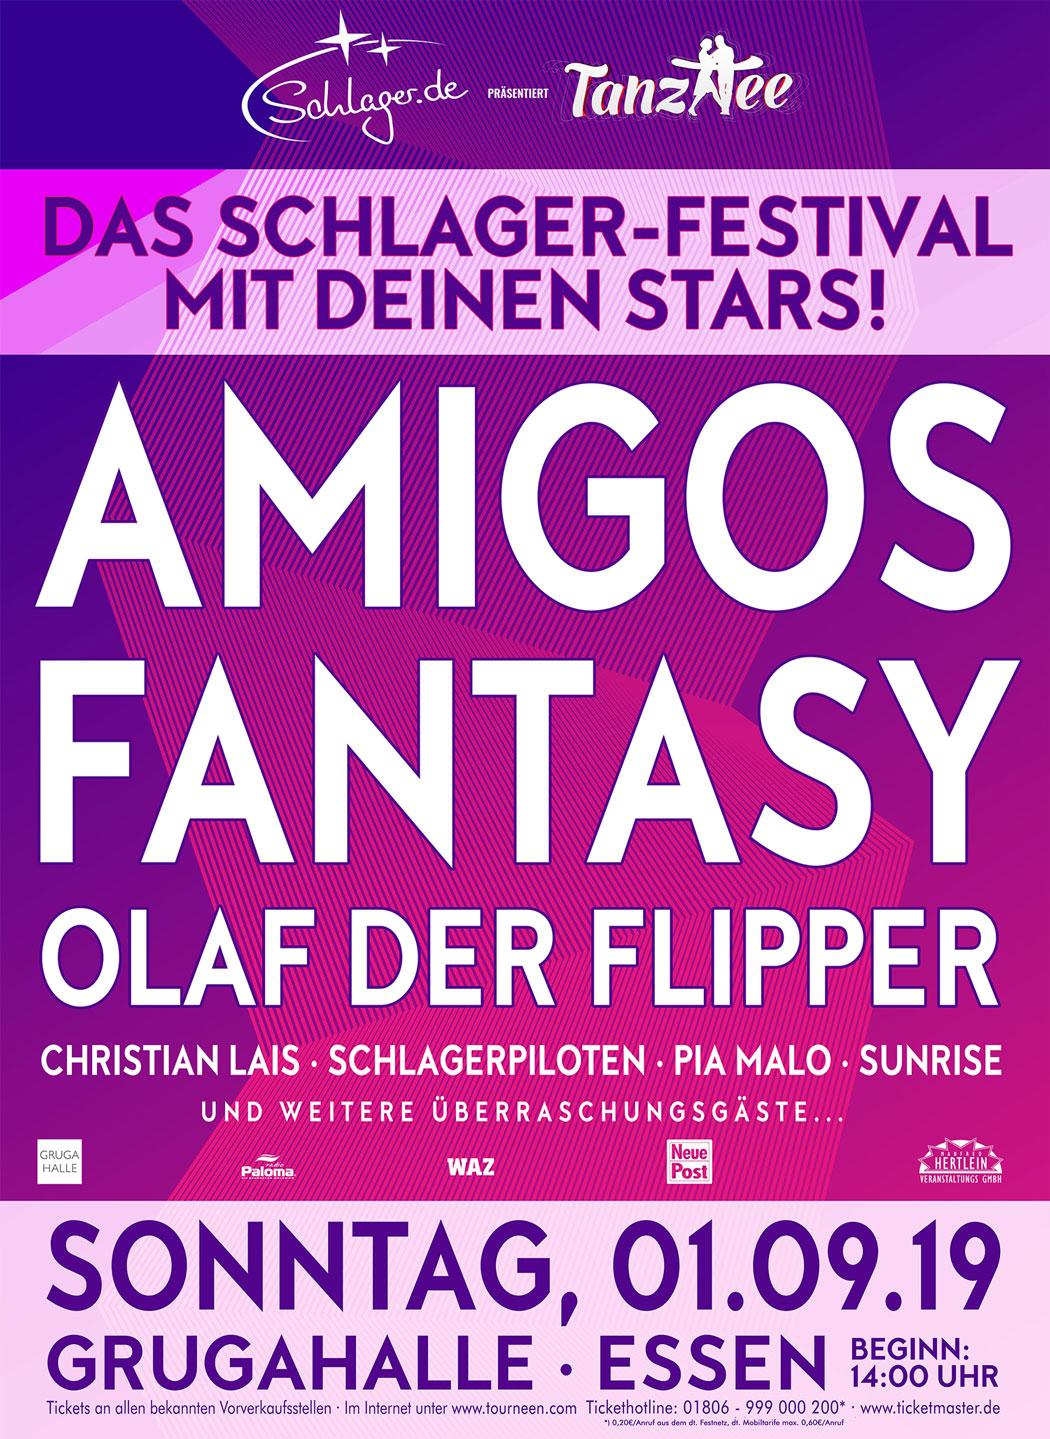 Schlager.de_Ticketshop